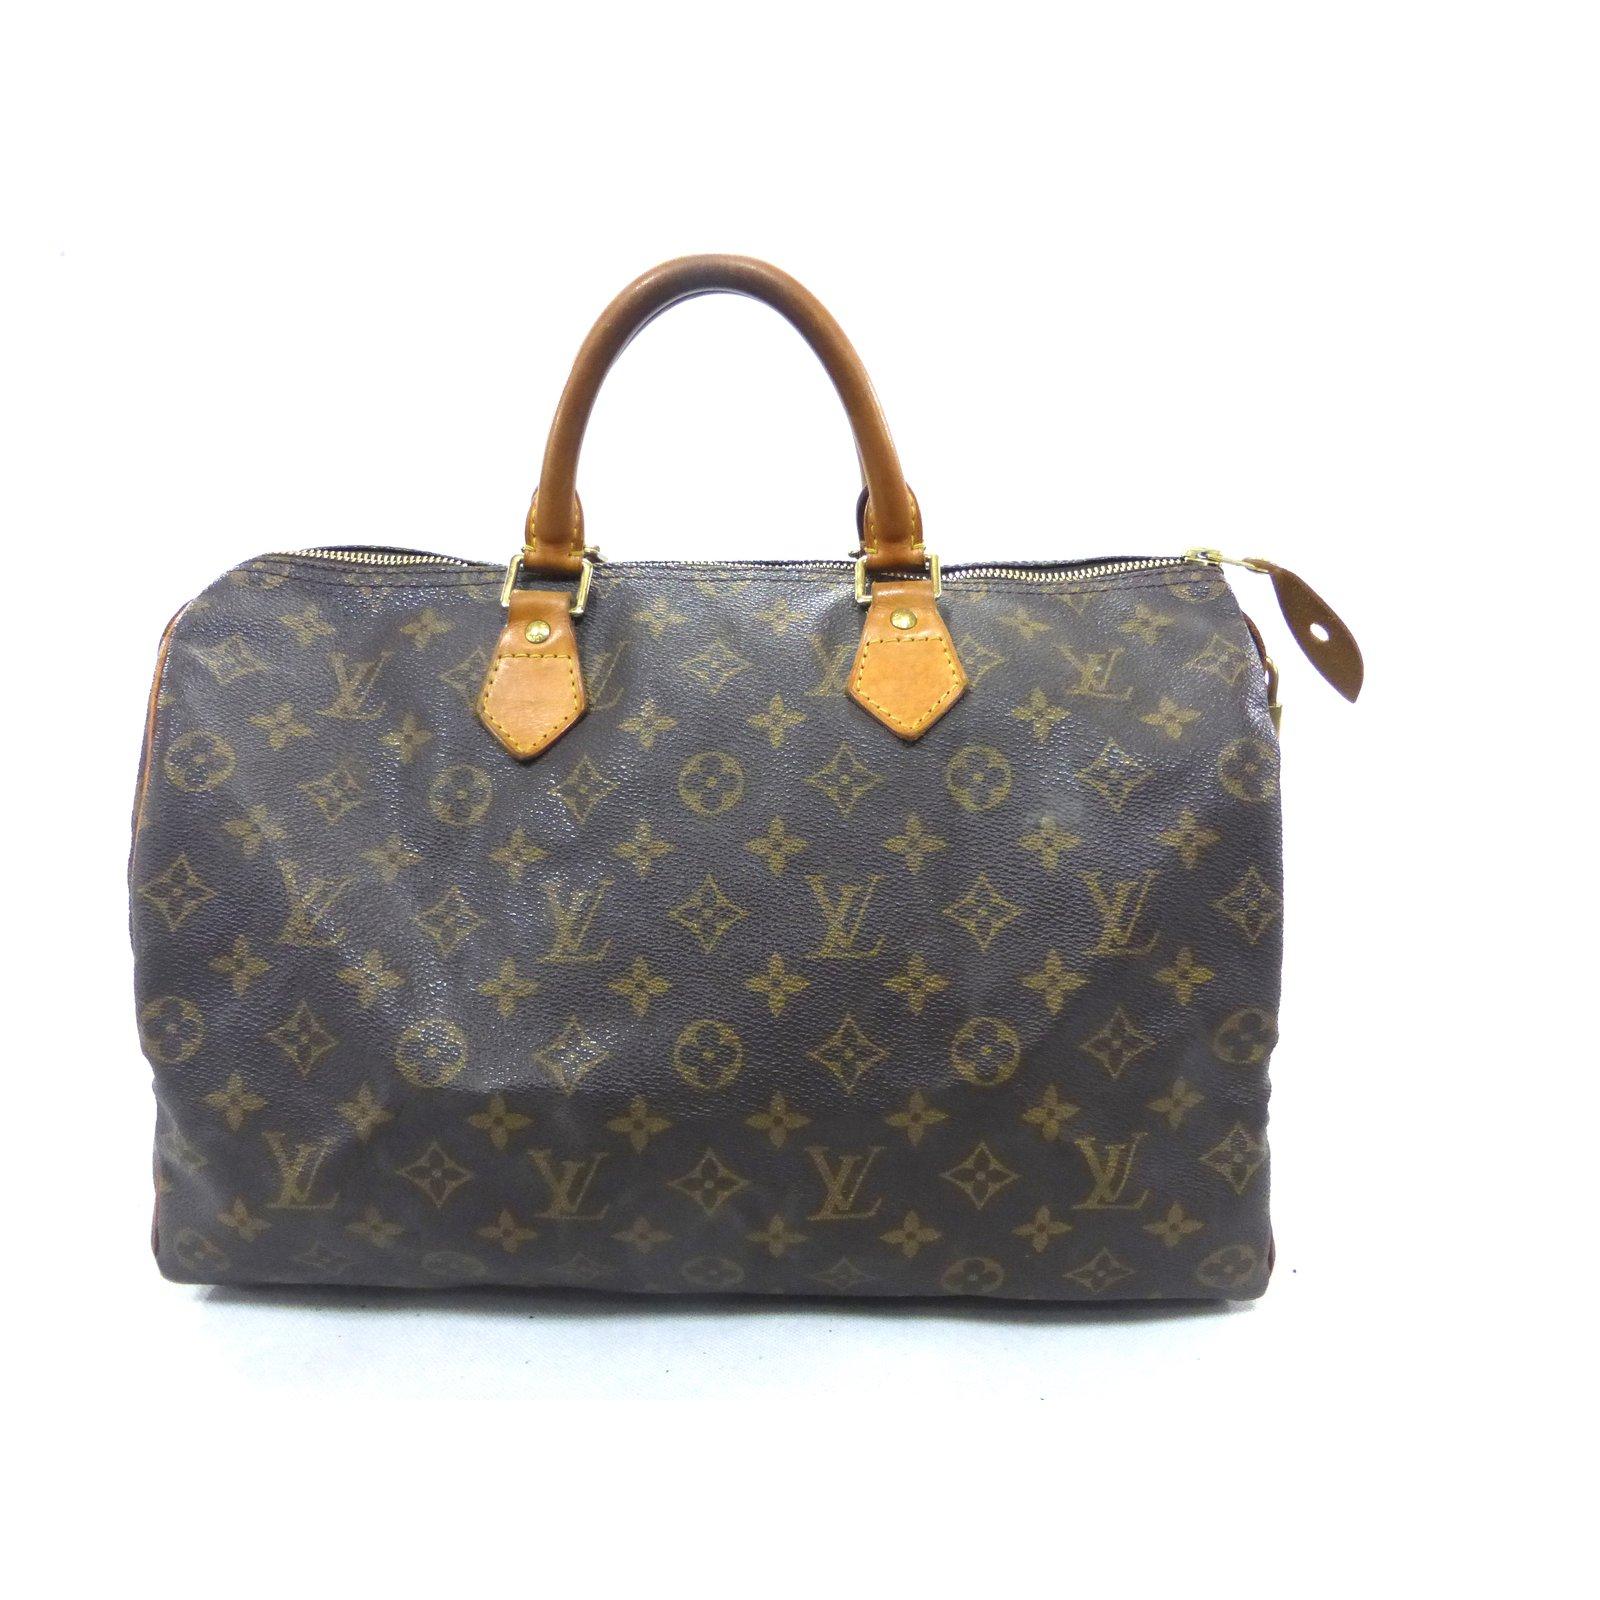 94656d37becd Louis Vuitton Speedy 35 Monogram Handbags Leather Brown ref.106564 ...